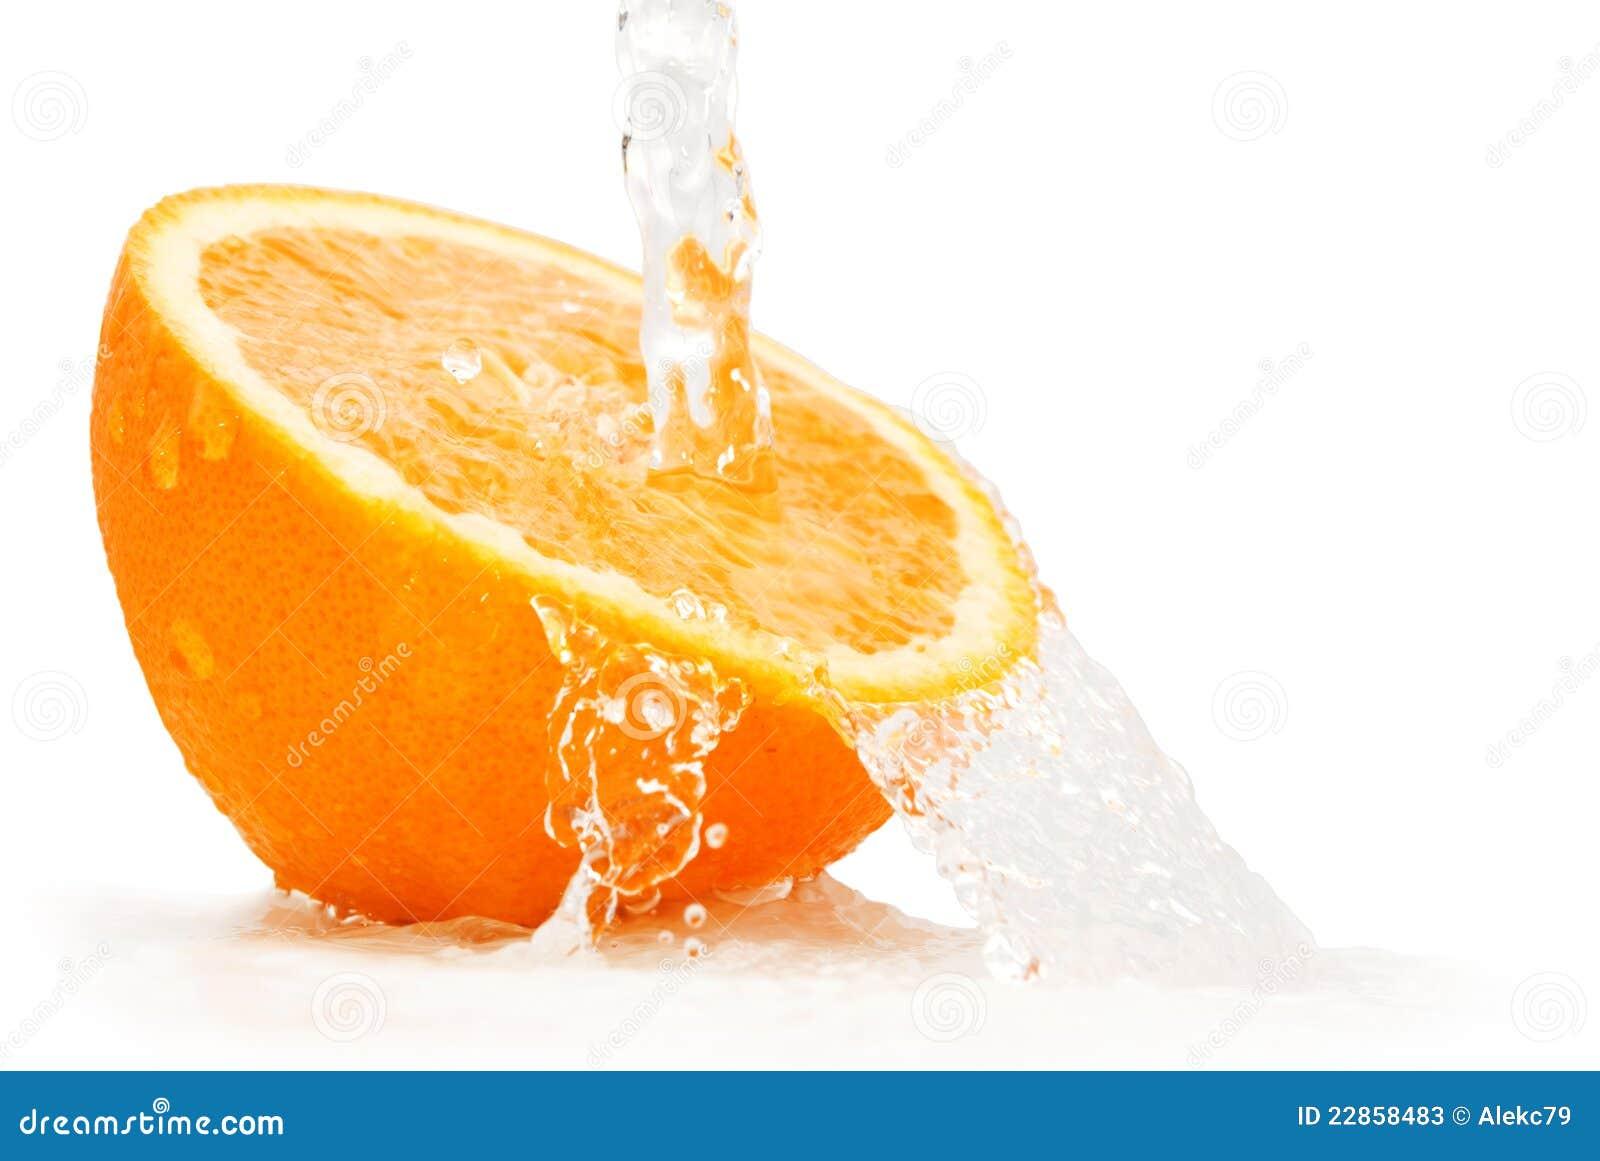 Fruta cítrica fresca